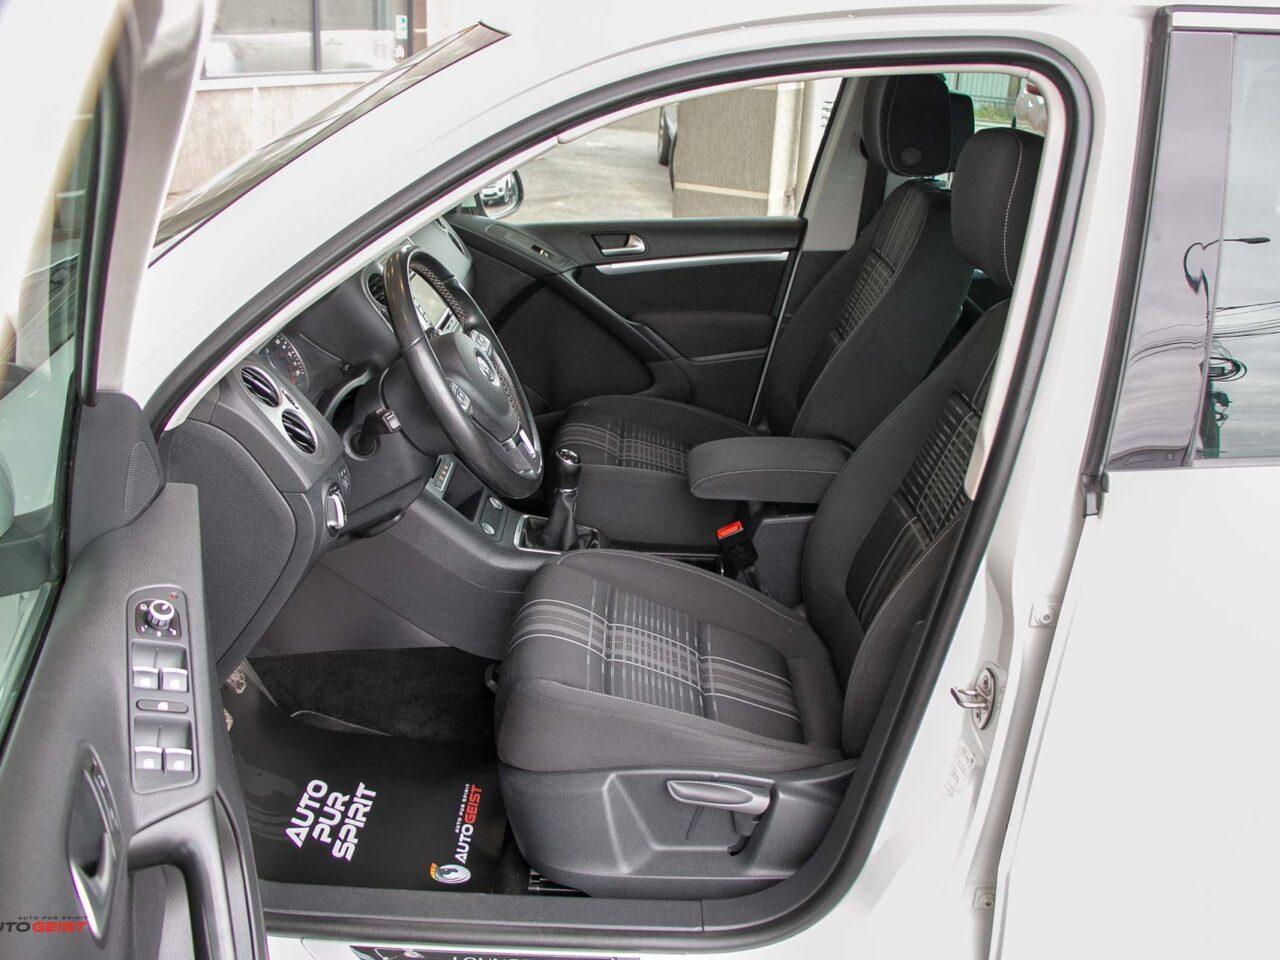 VW-TIGUAN-2015-manual-3481